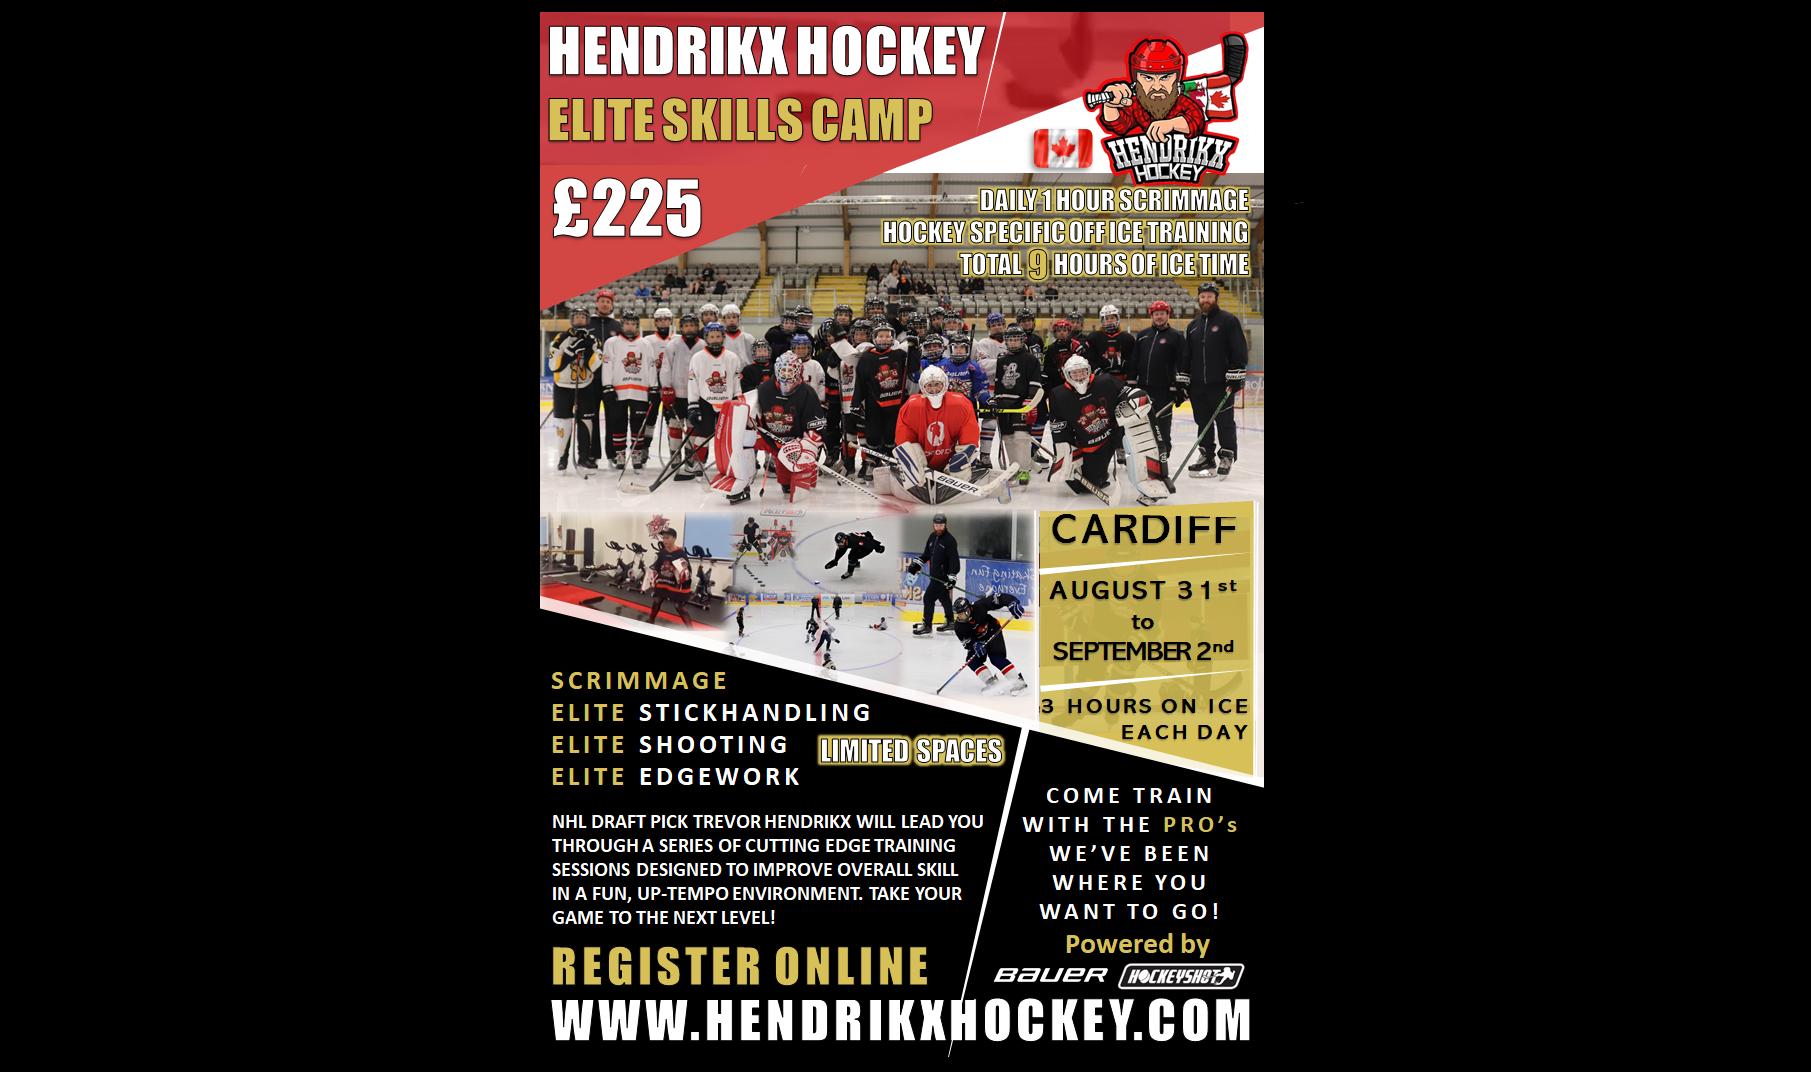 Cardiff Elite Skills Camp